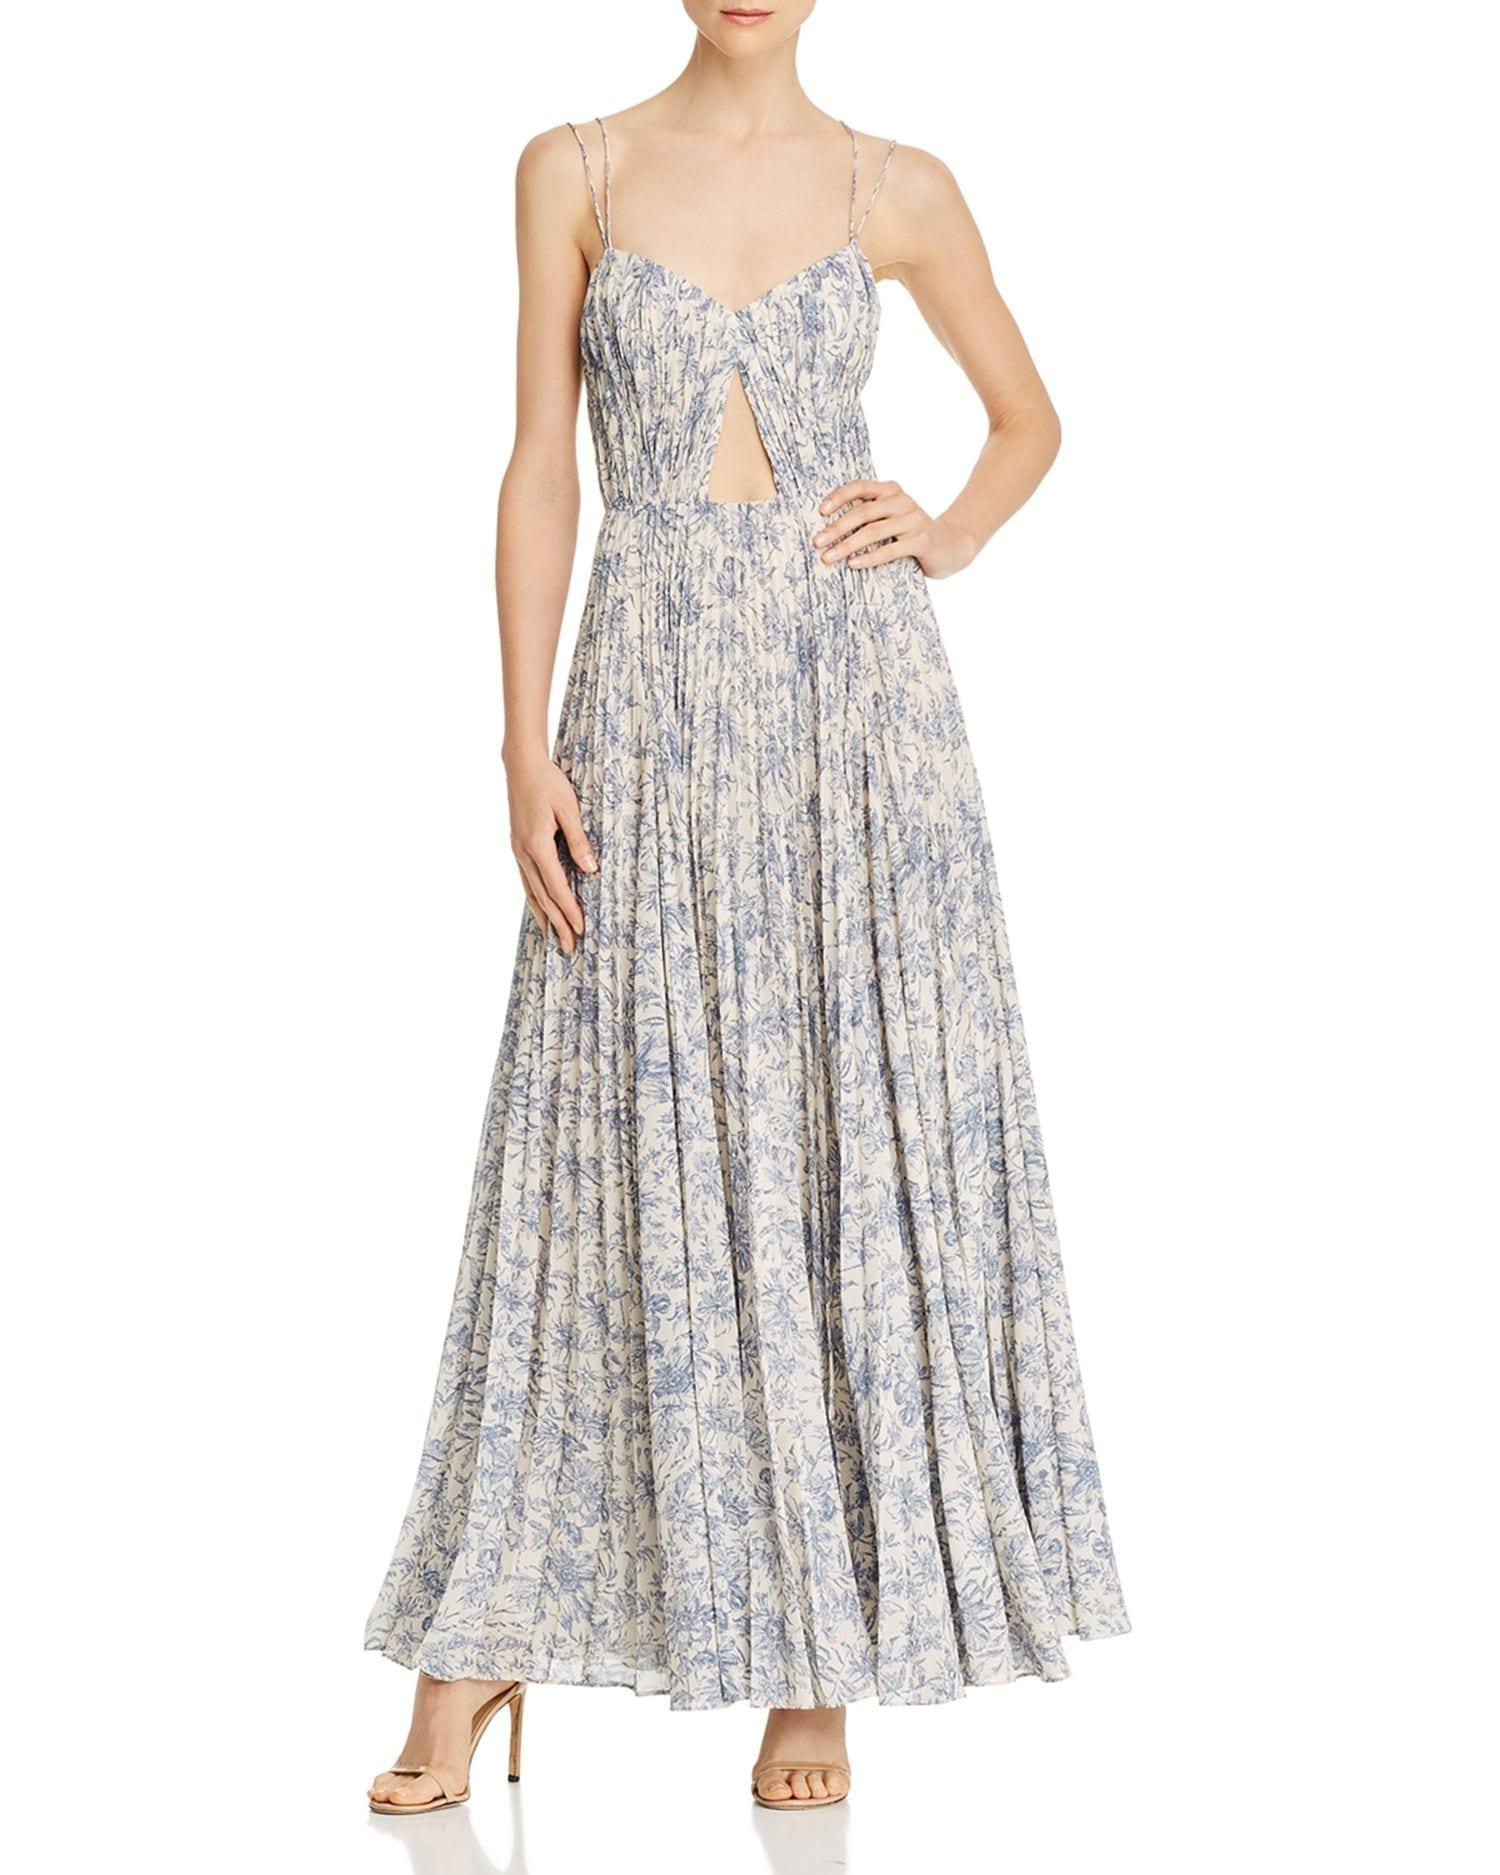 AMUR Lucy Floral Sleeveless Maxi Dress